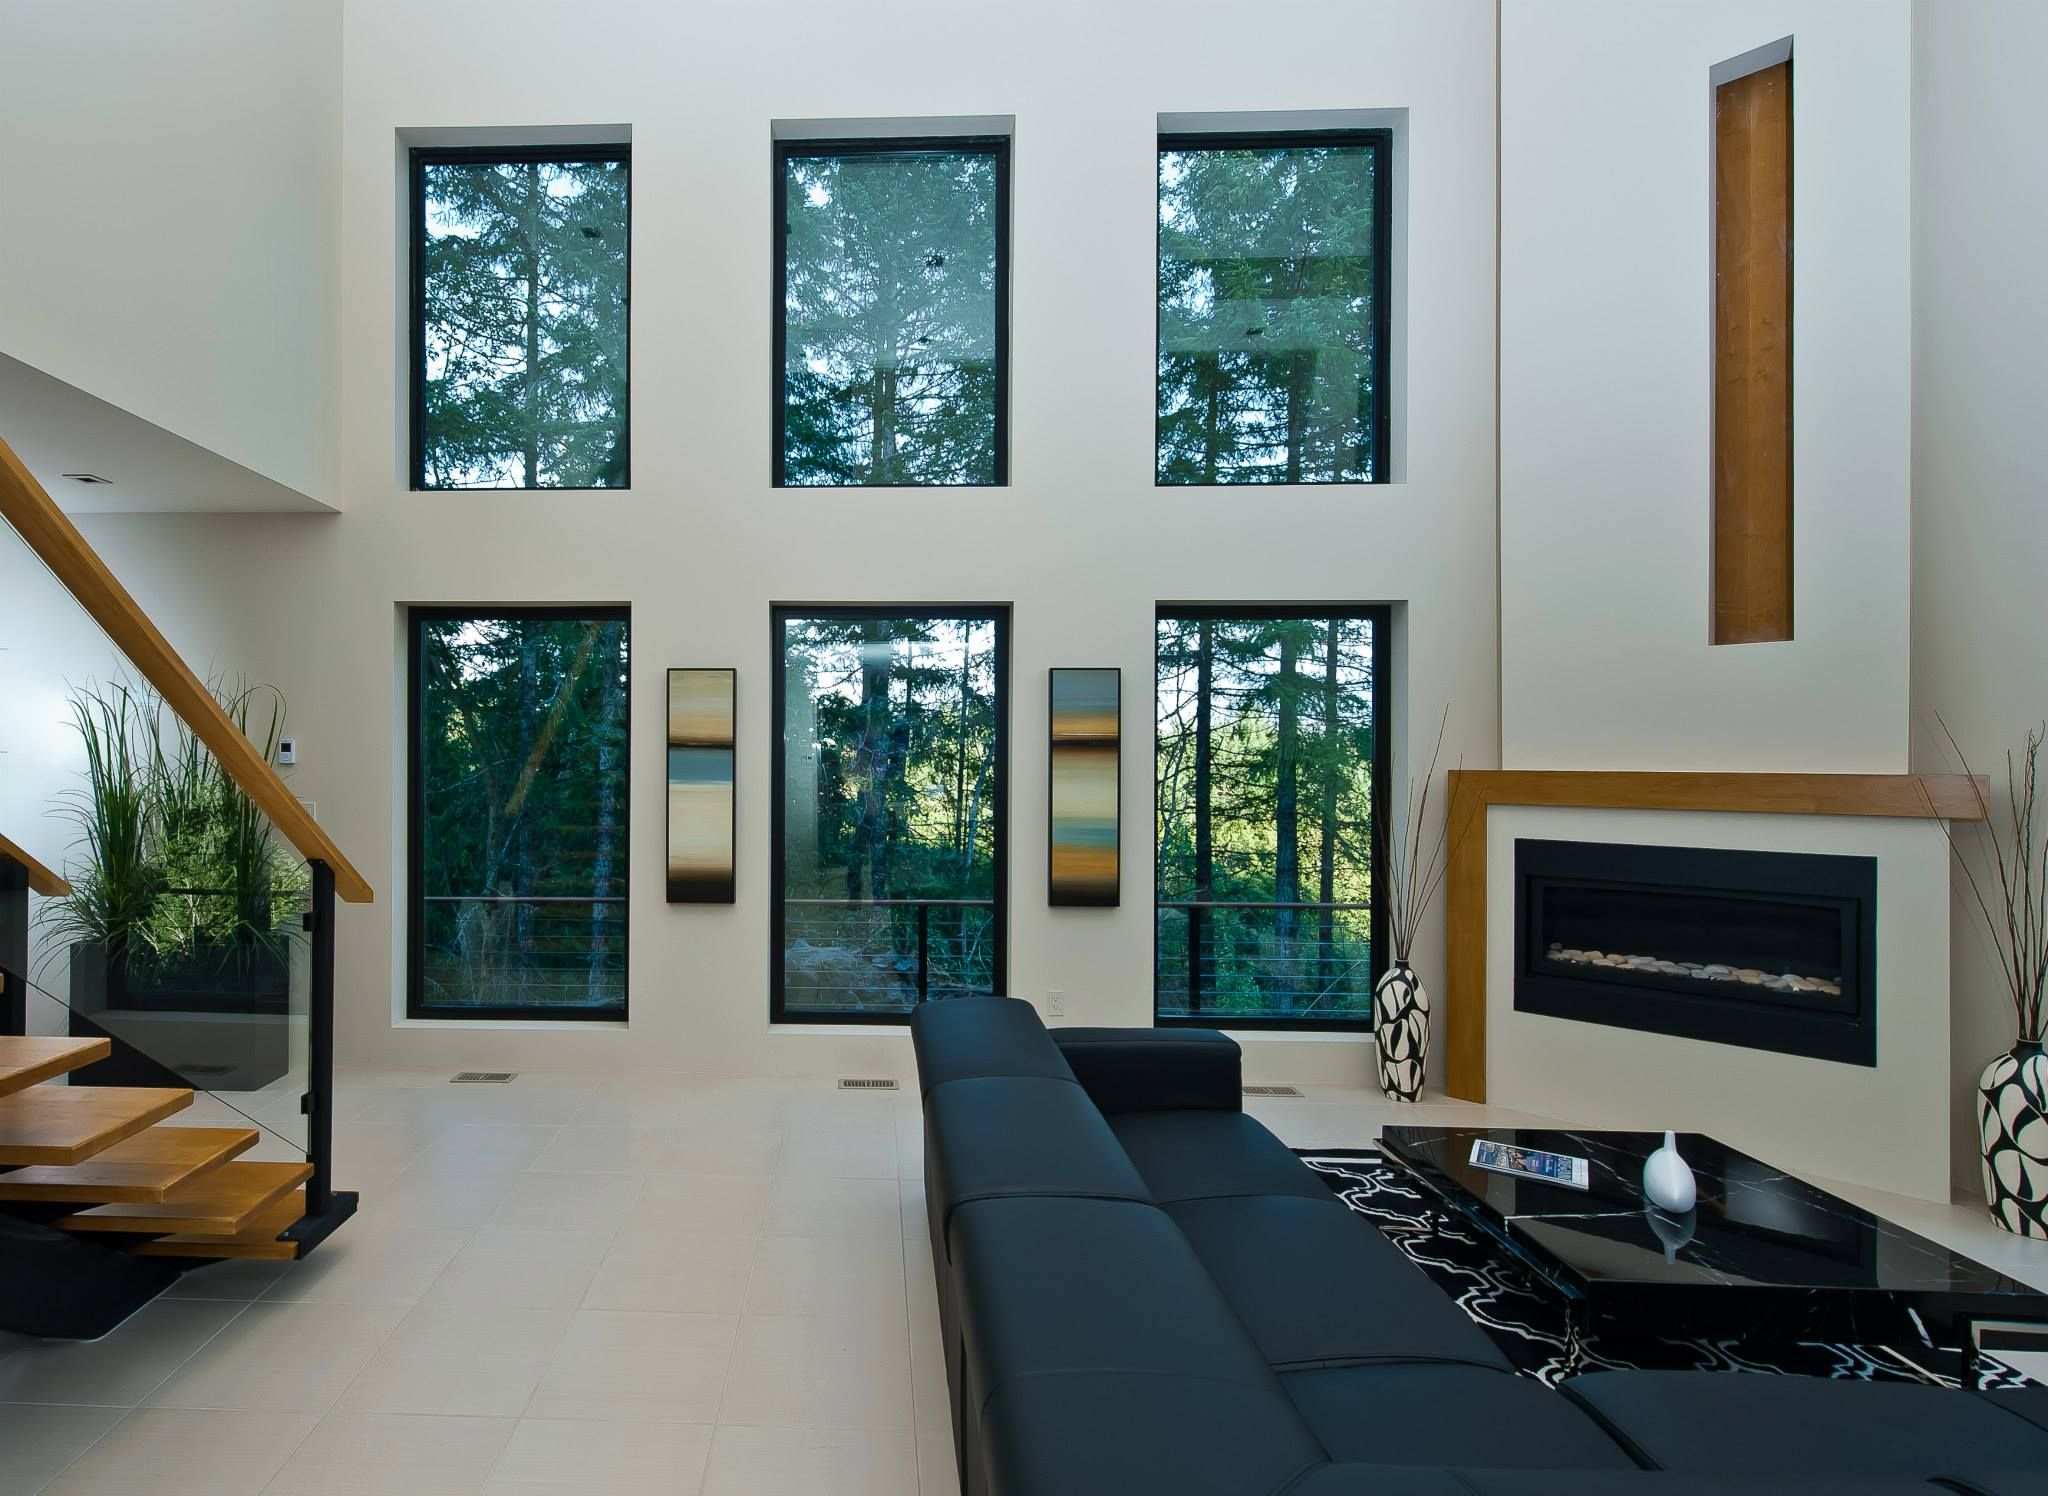 Alair Homes | Nanaimo | Custom Homes   Black Framed Casement Windows Invite  Natural Light